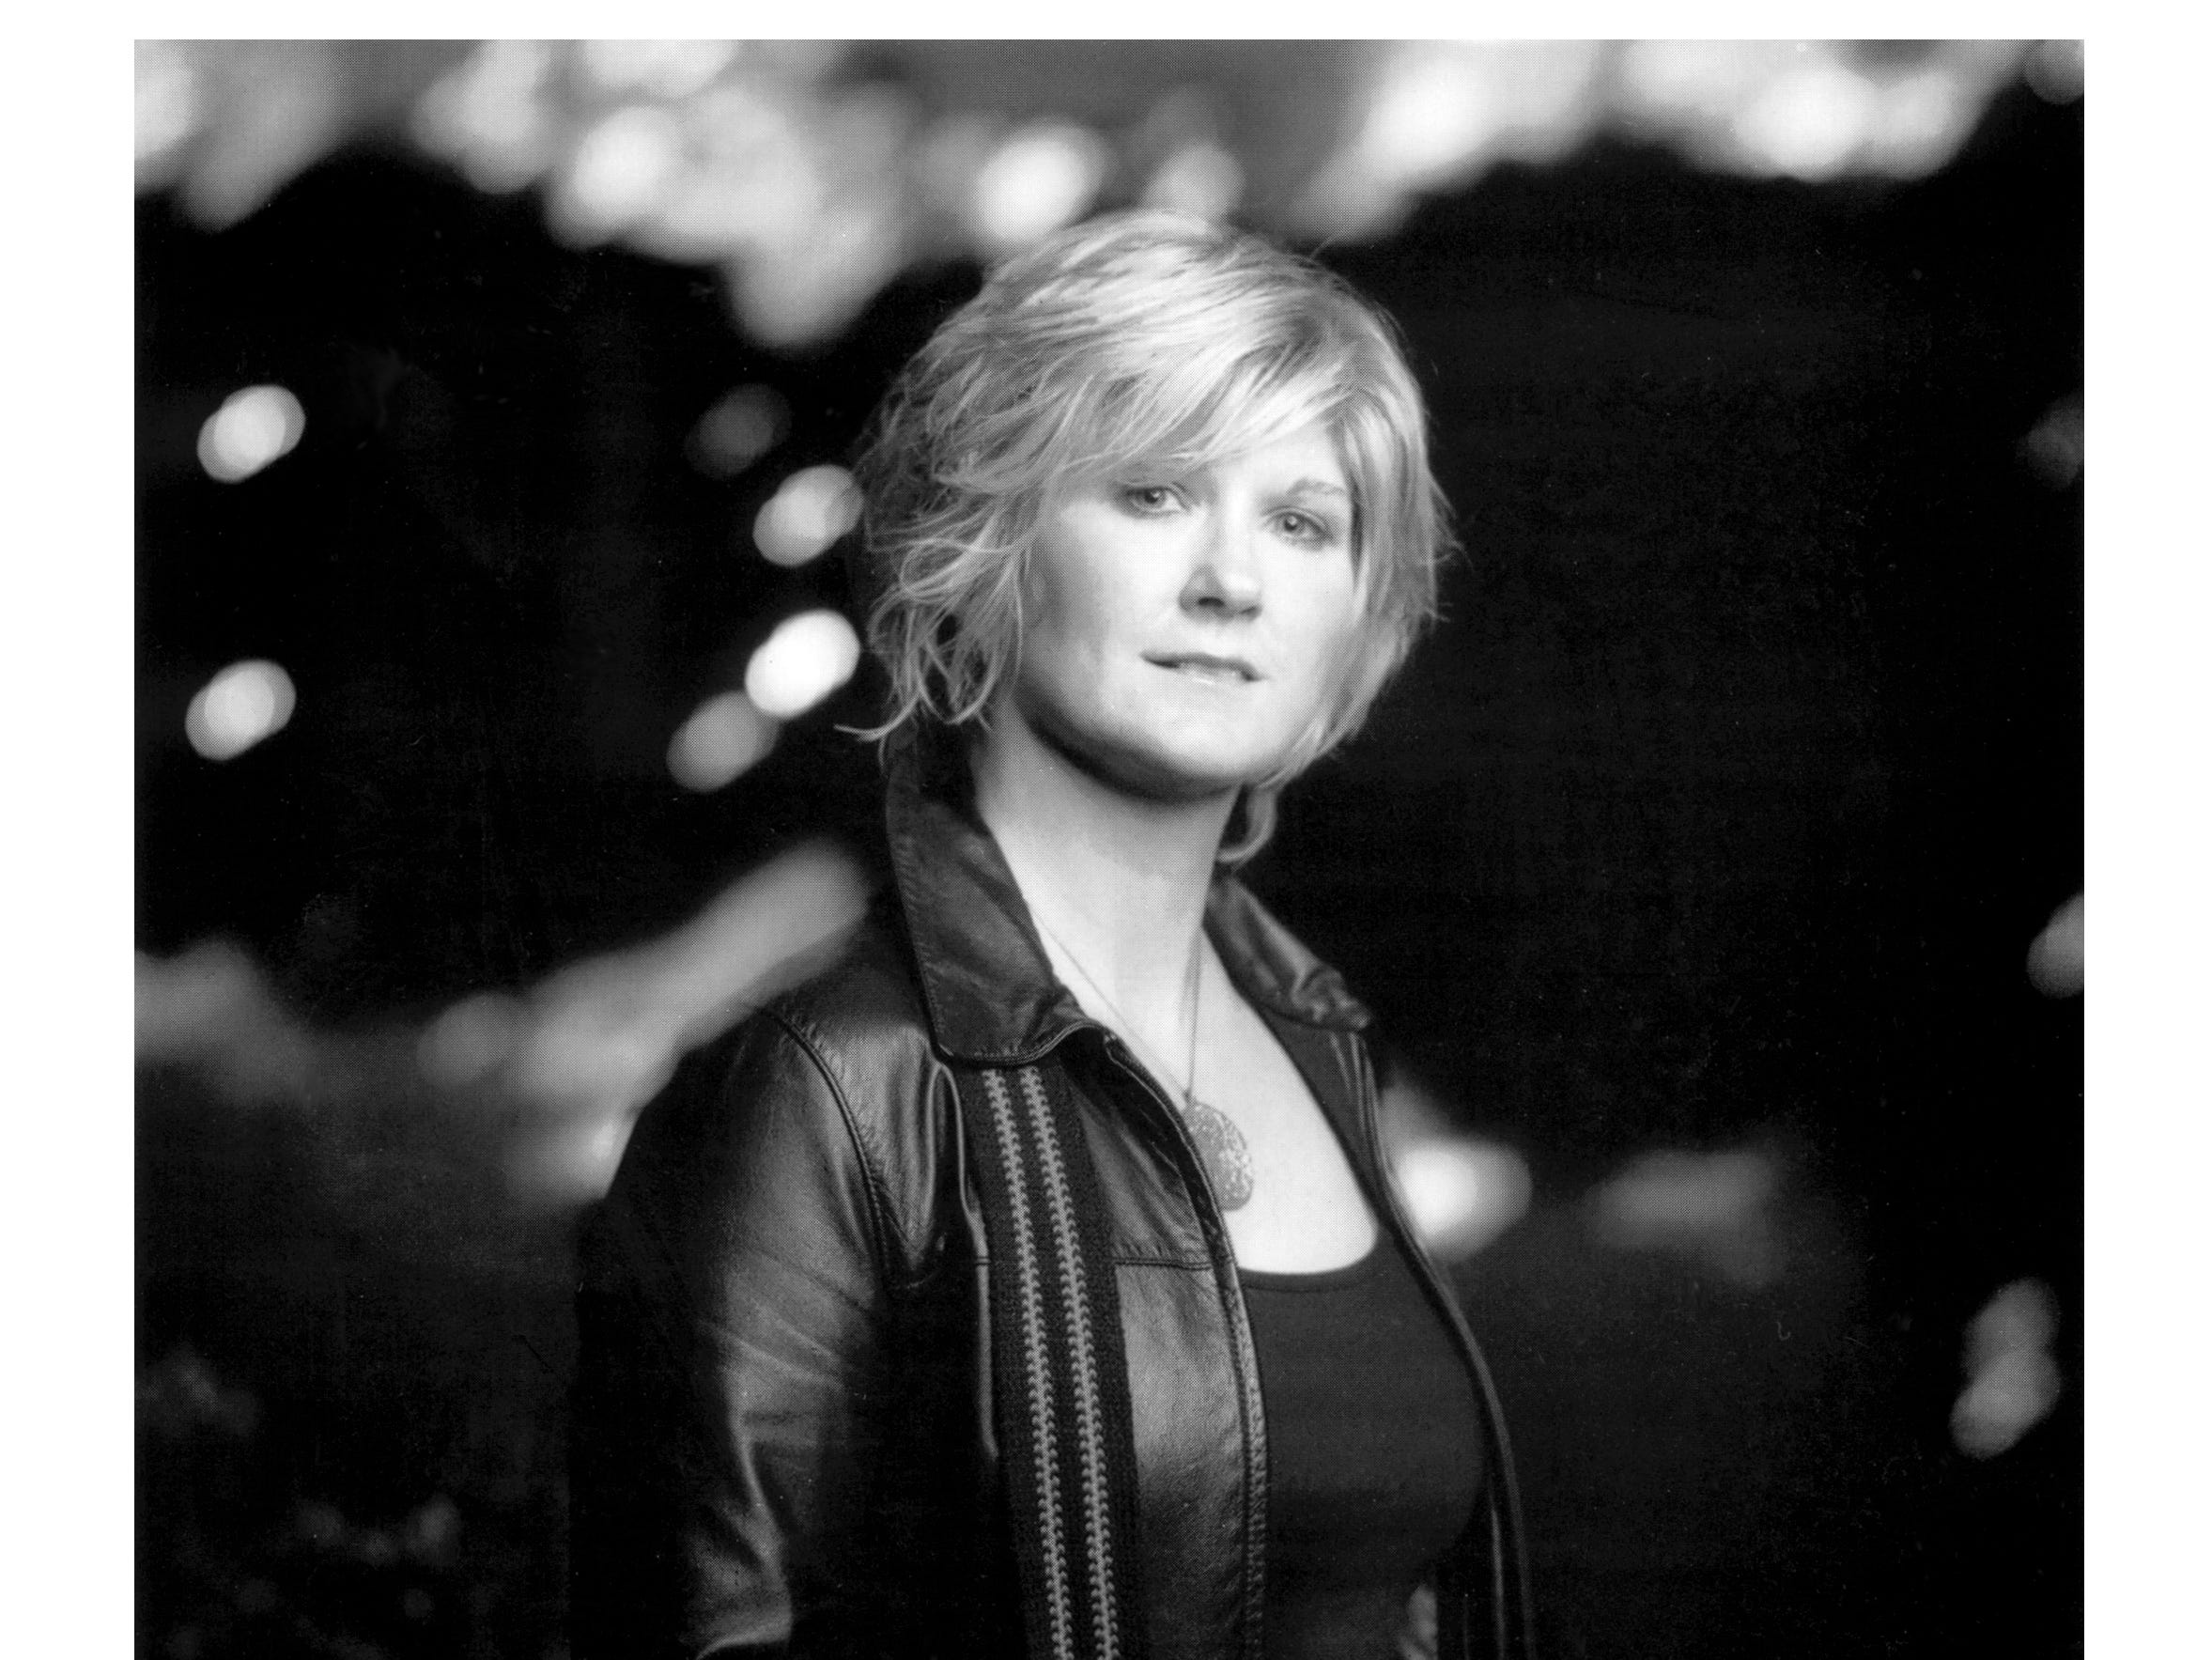 Jazz vocalist Dena DeRose, born in Binghamton, NY.